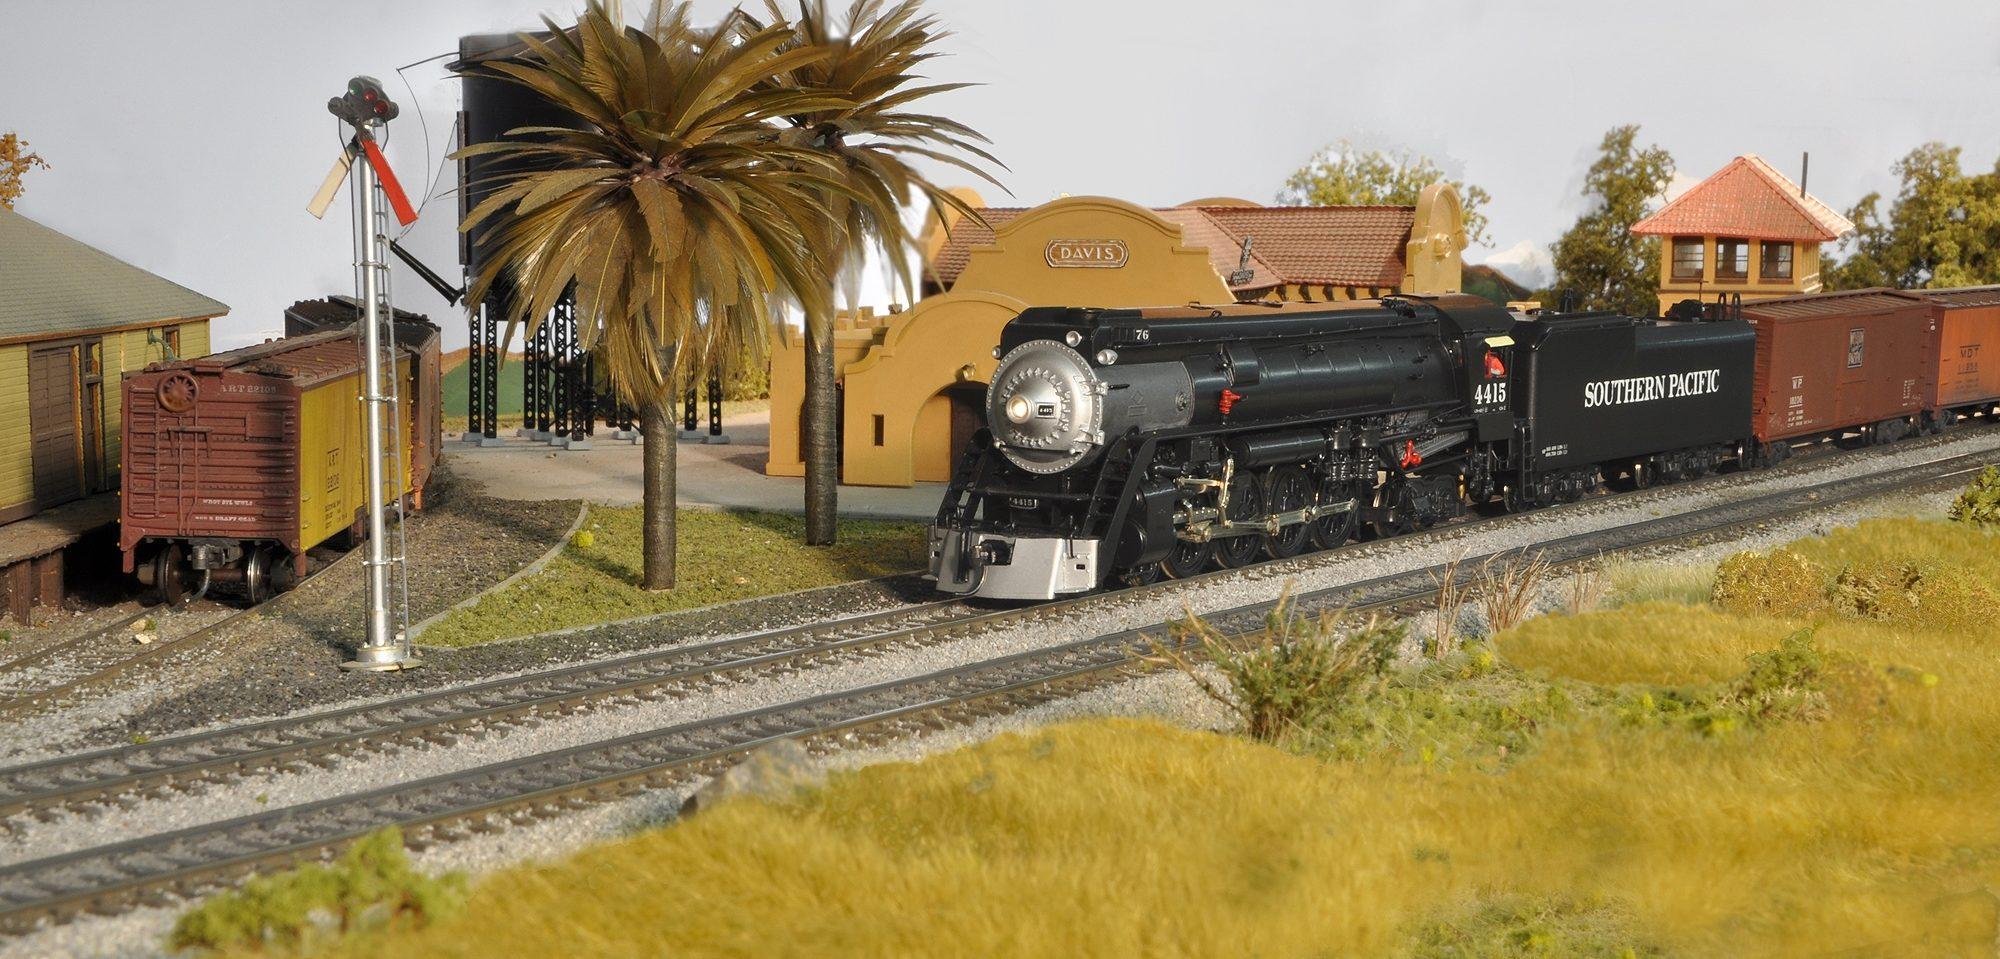 Sacramento Model Railroad Historical Society Interpreting History Through Model Railroading